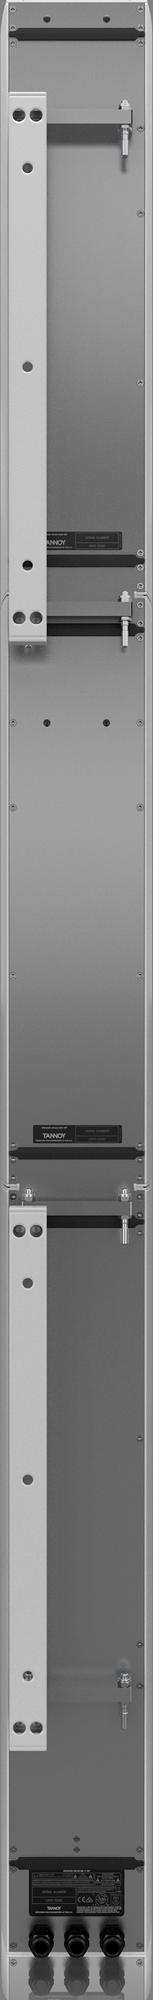 Tannoy  QFLEX 40-WP - Installatiespeaker